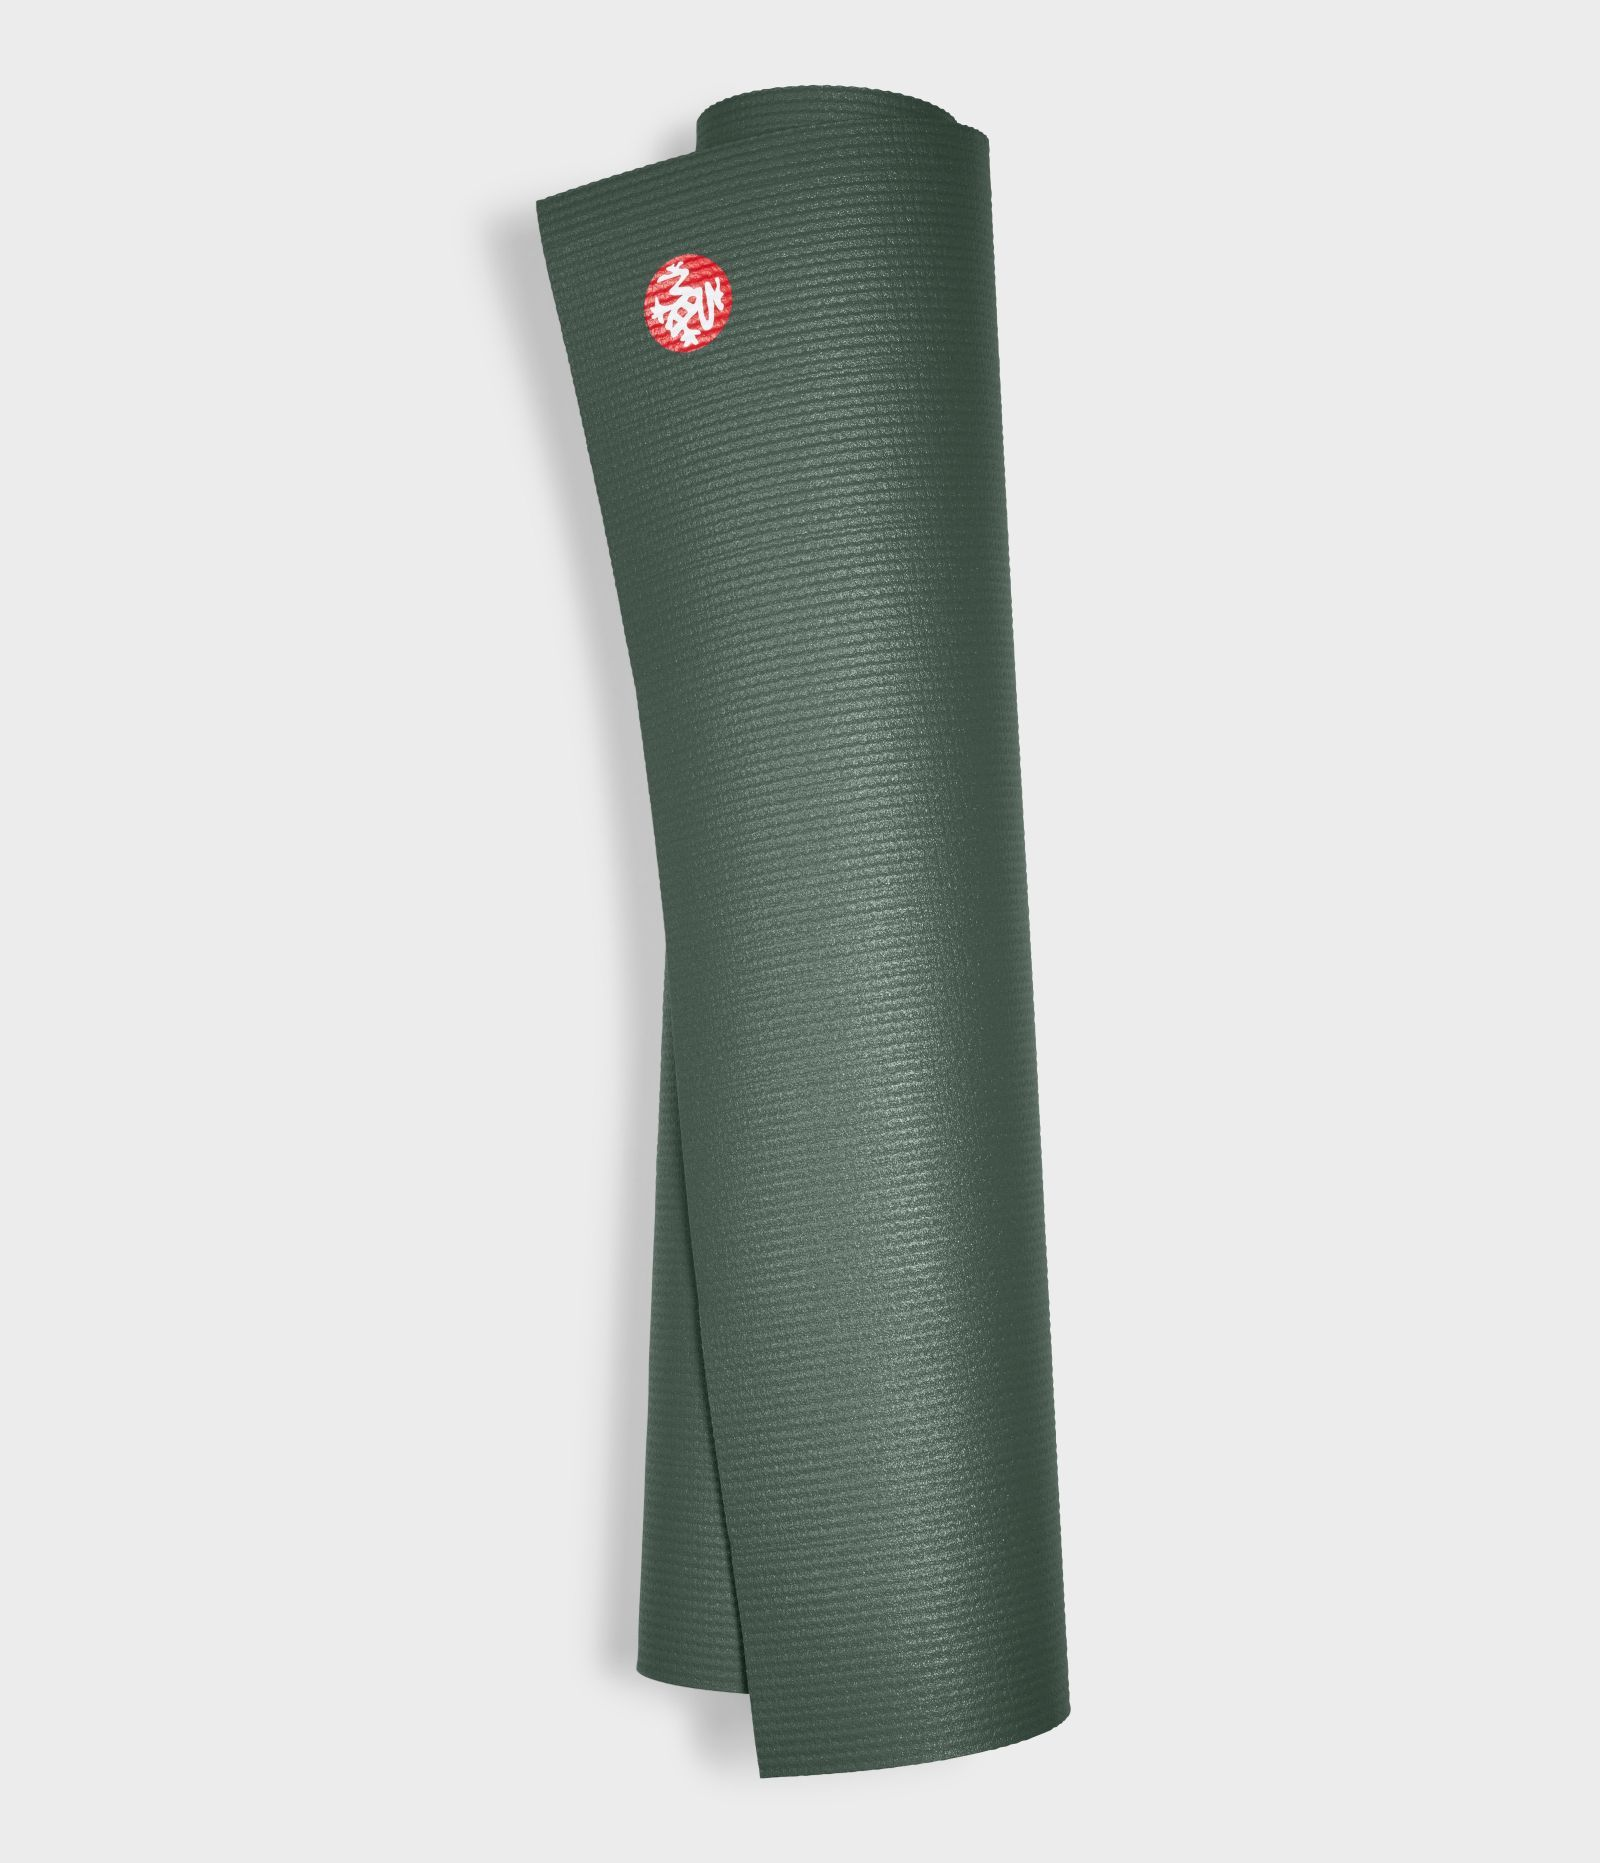 Manduka prolite pro lite yoga mat black sage green